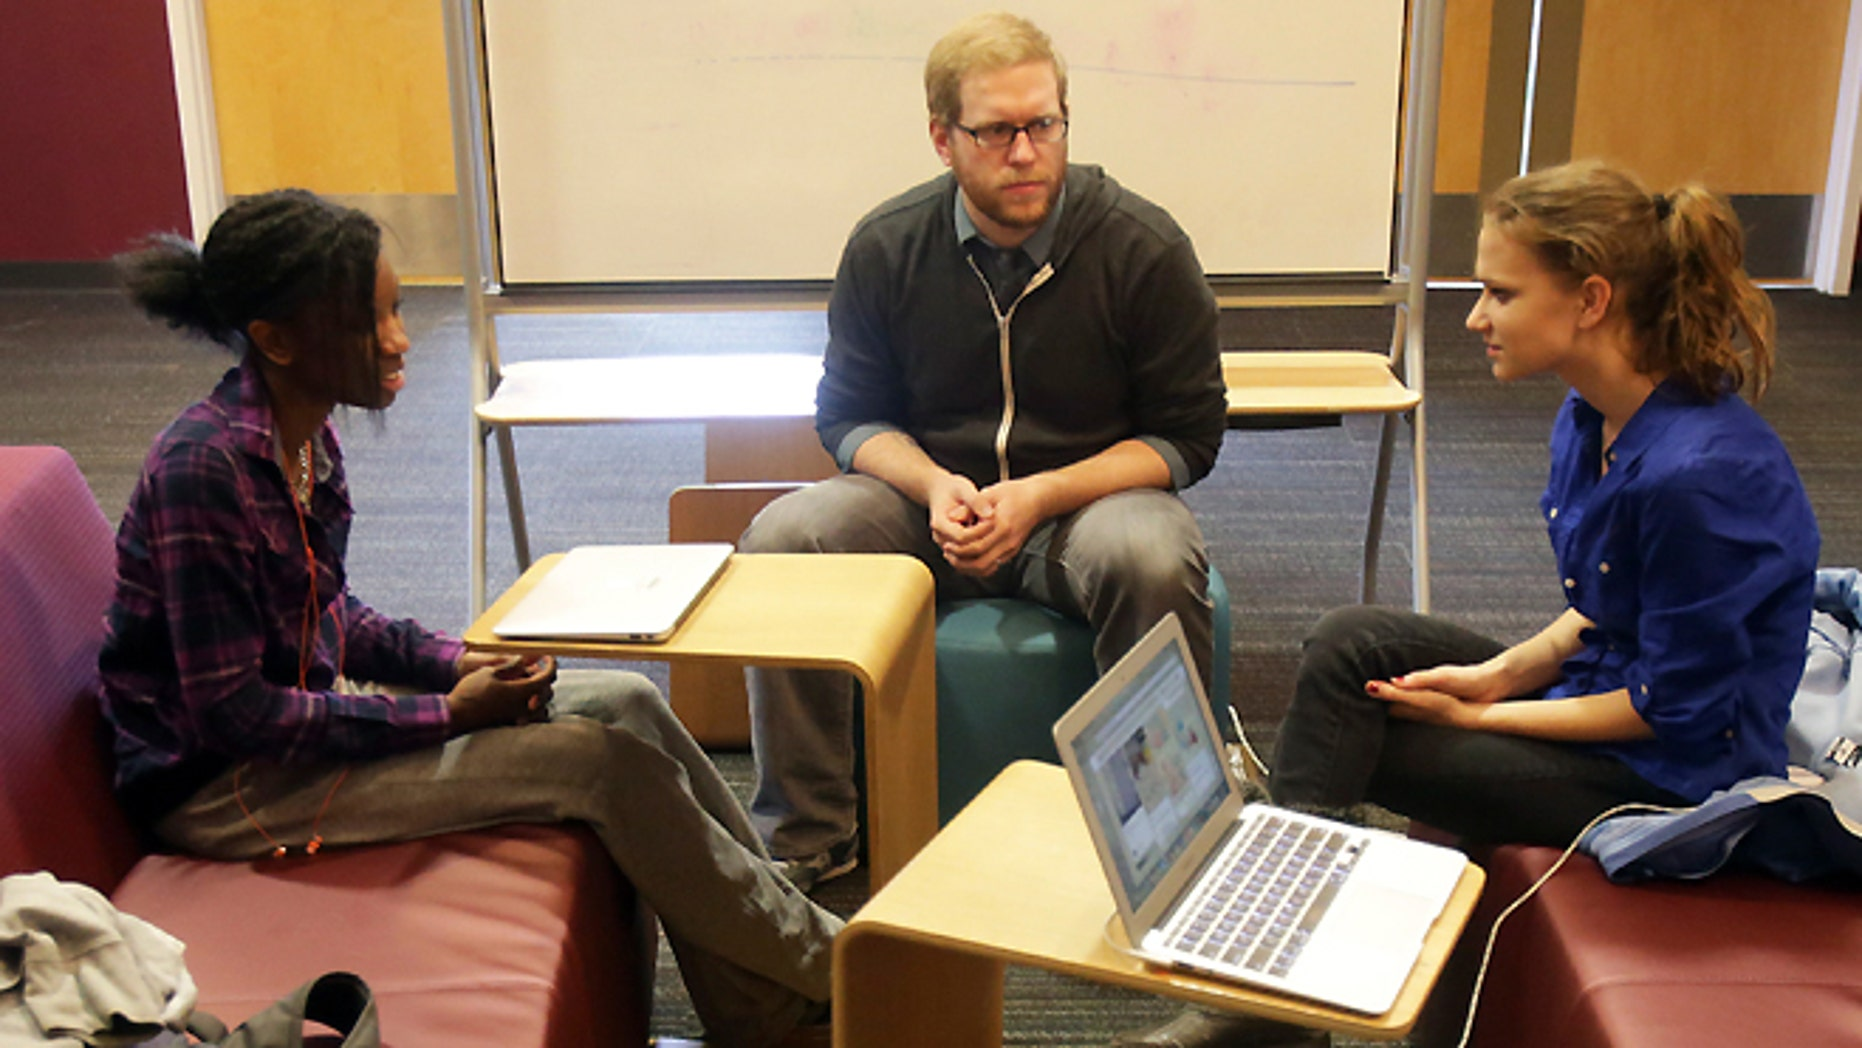 FILE -- English teacher Tom Rademacher talks with his high school juniors Kierra Murray, left, and Ana Silverman, right, at Fair School in Minneapolis.